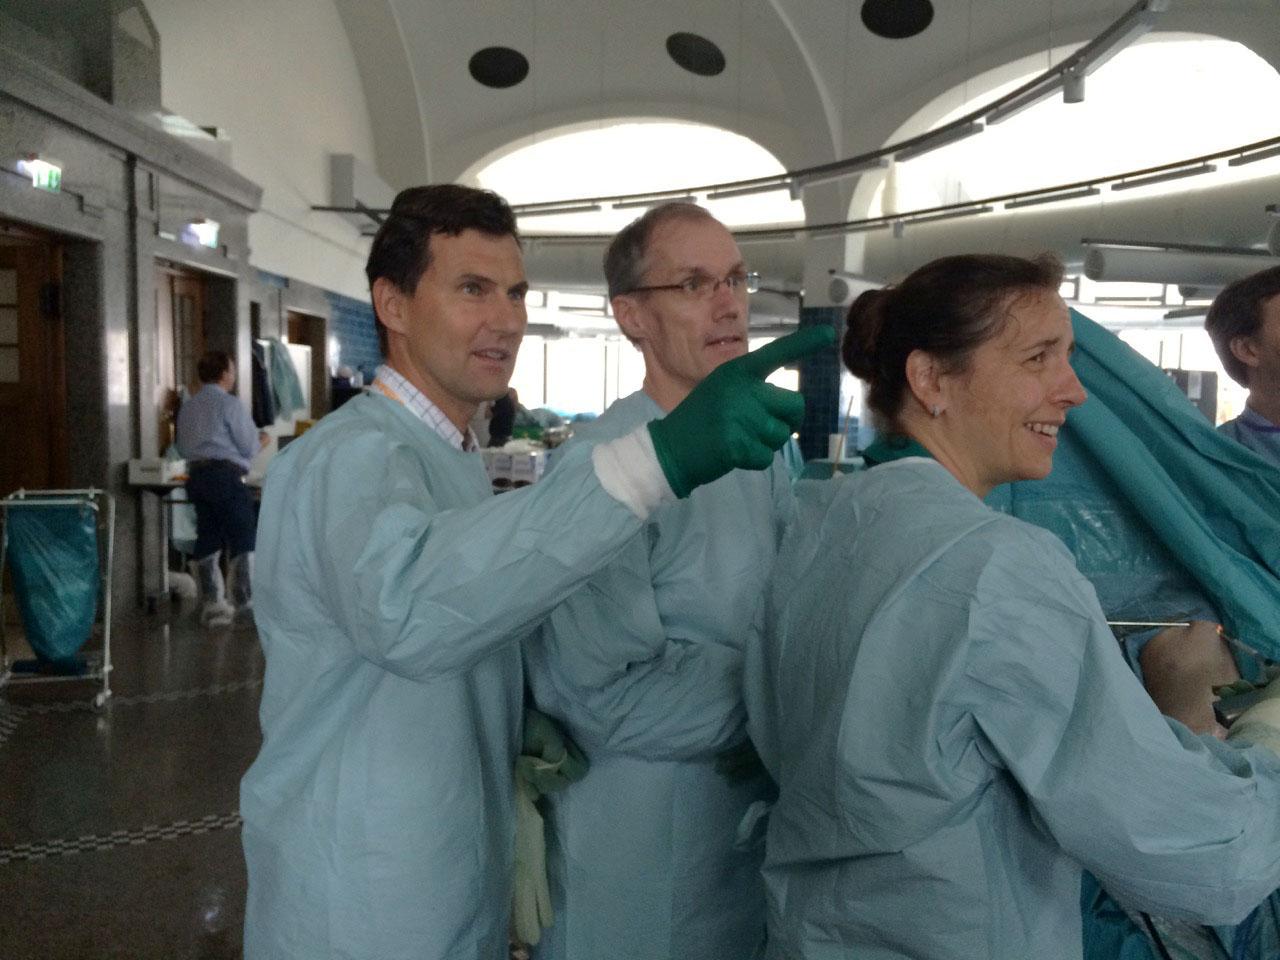 Arthroskopische Schulterstabilisierung Dr. Stefan Mengel